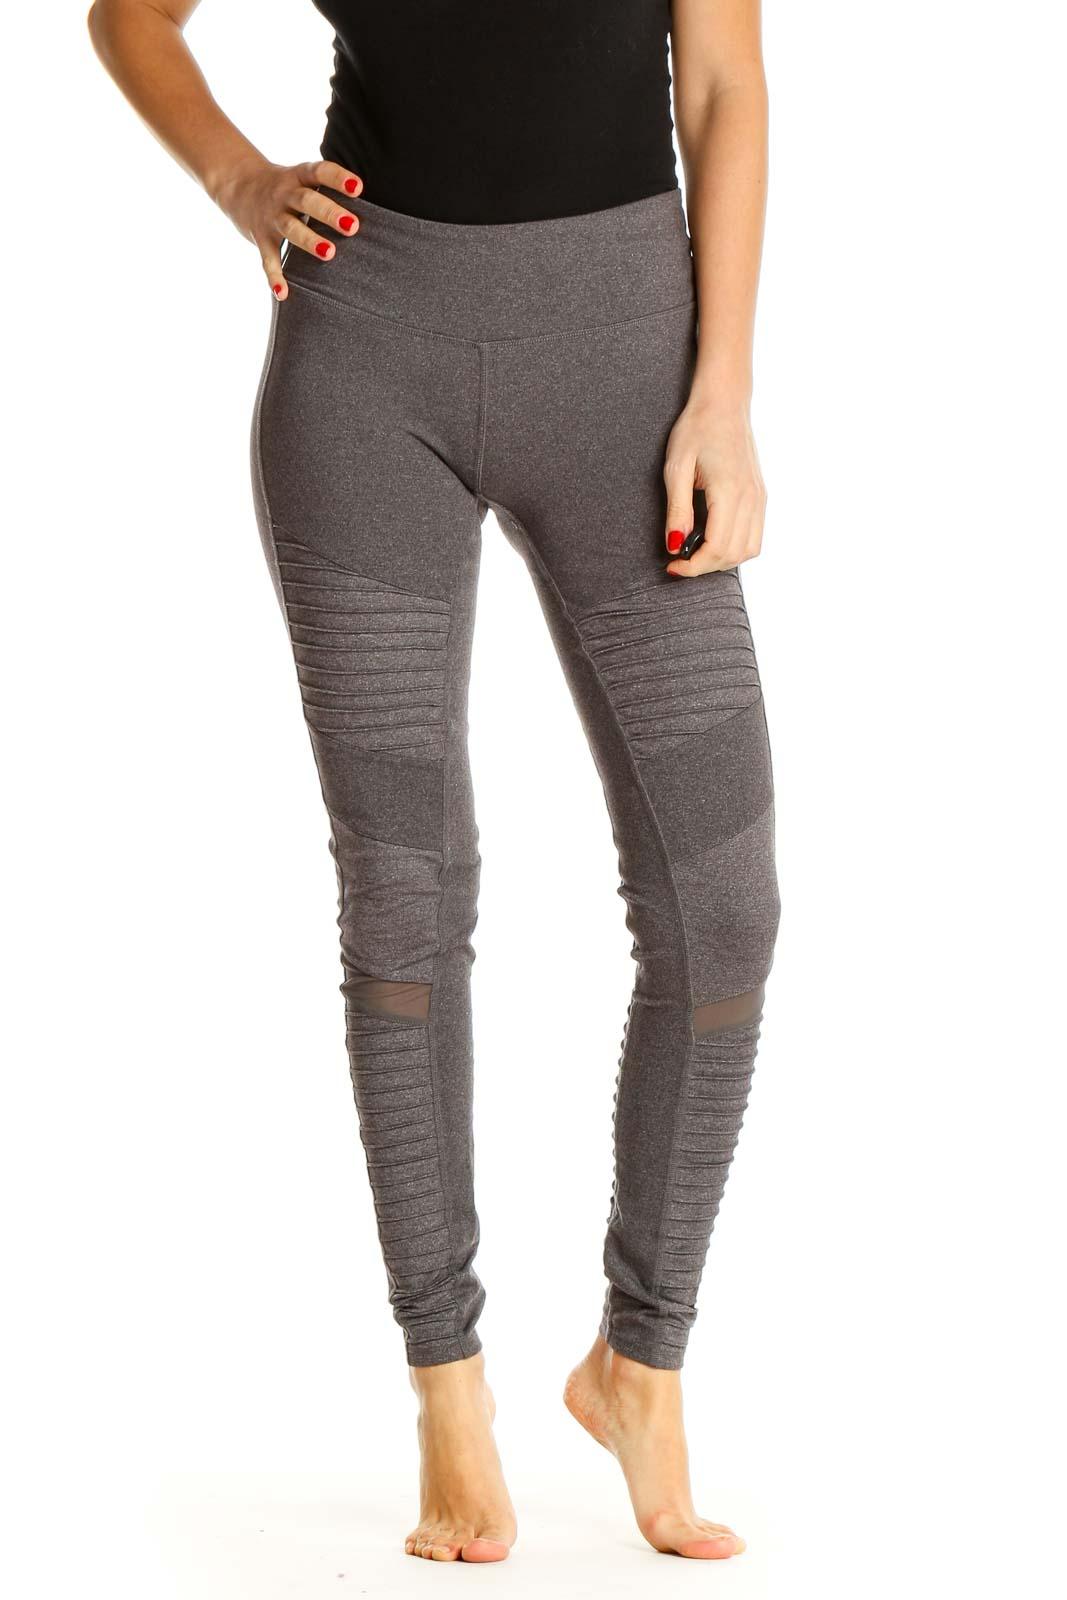 Gray Textured Activewear Leggings Front